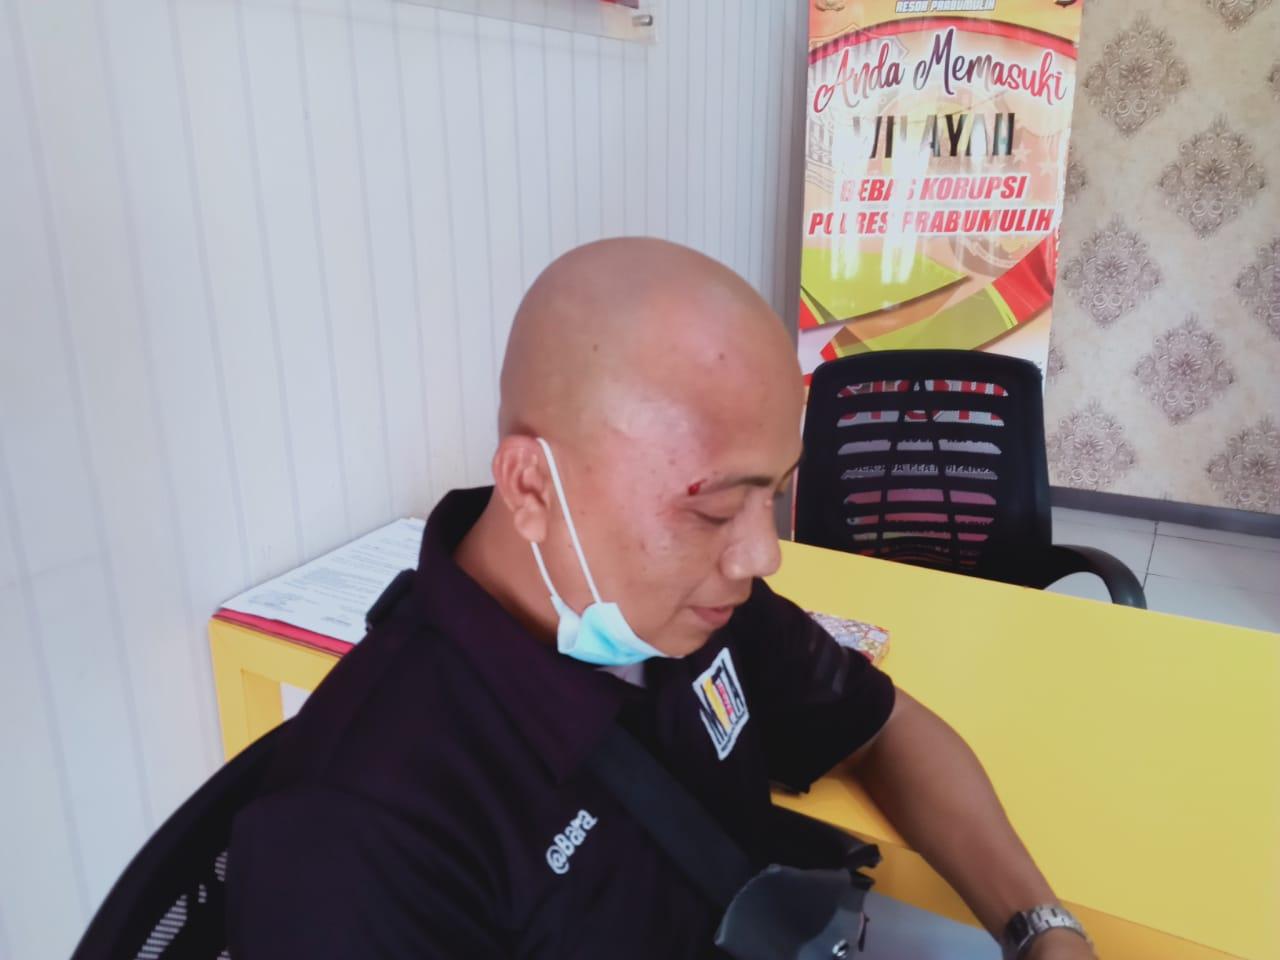 Diduga Tak Senang Ditegur, Pengunjung Dinas PUPR Prabumulih Aniaya Wartawan